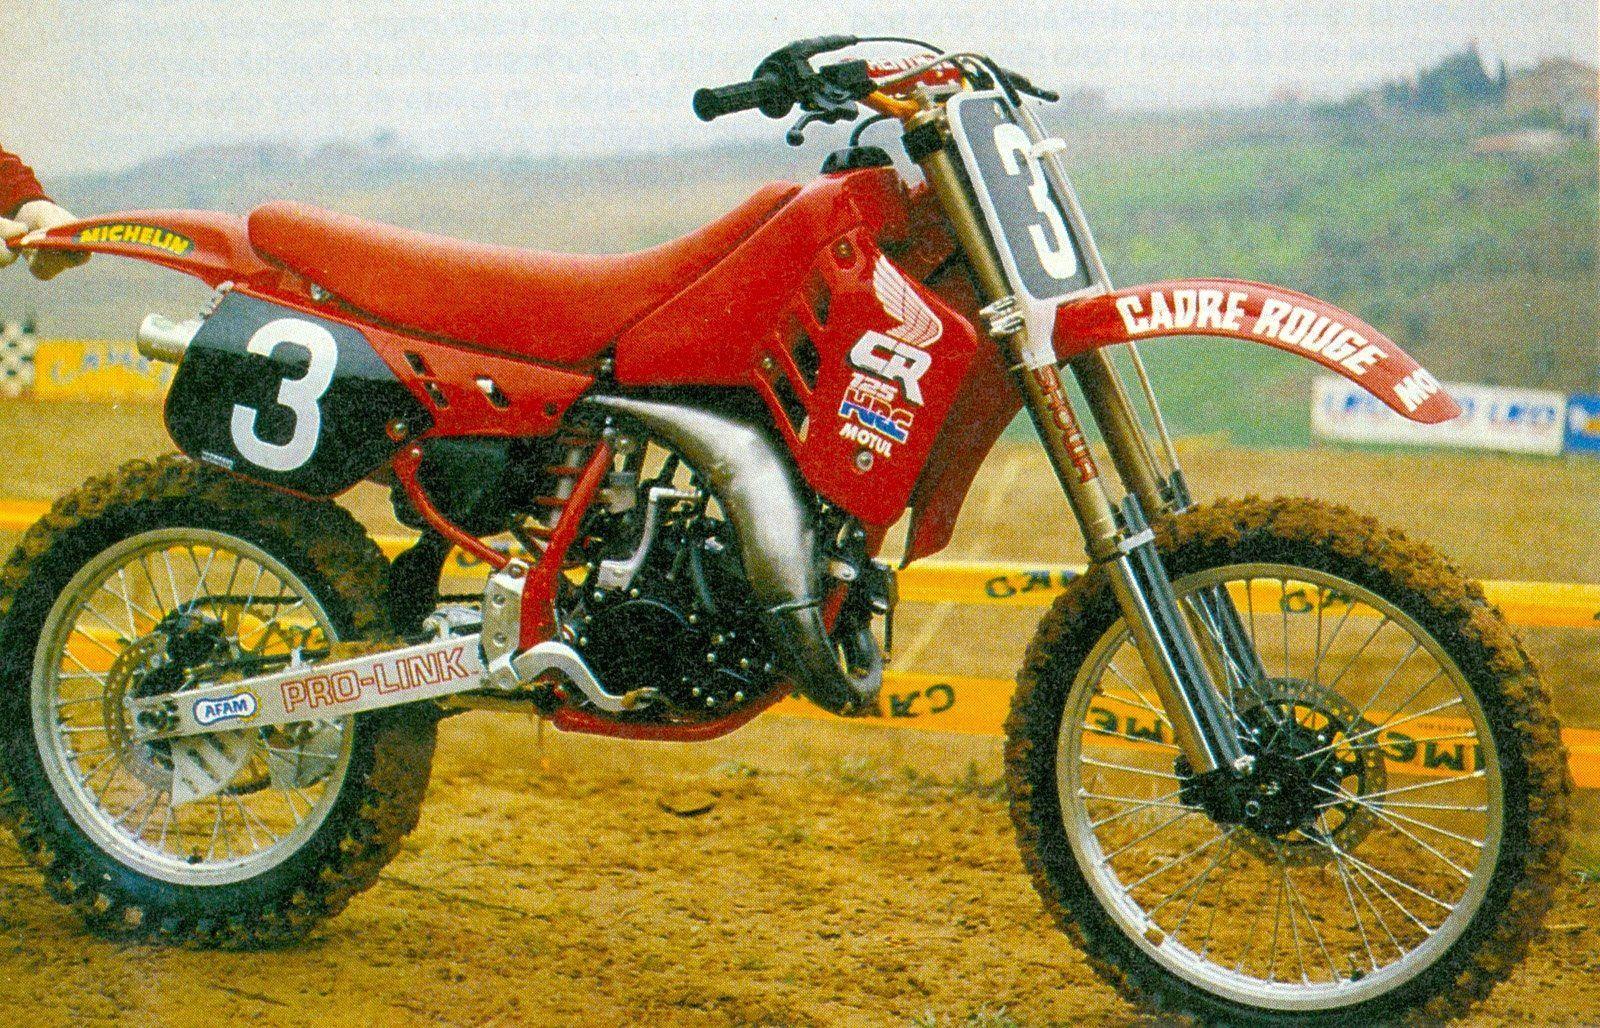 JMBayle's 1988 works Honda CR125 | Vintage motocross ...